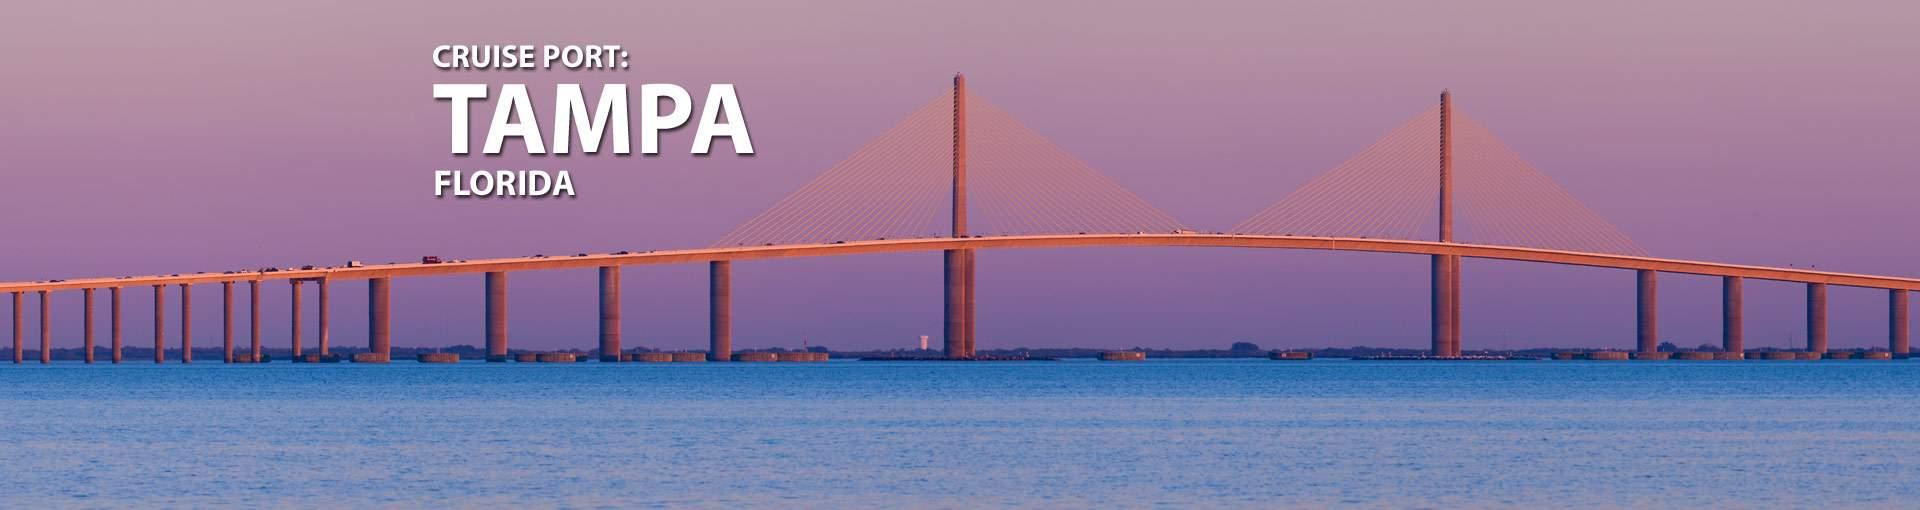 Cruise Port: Tampa, Florida